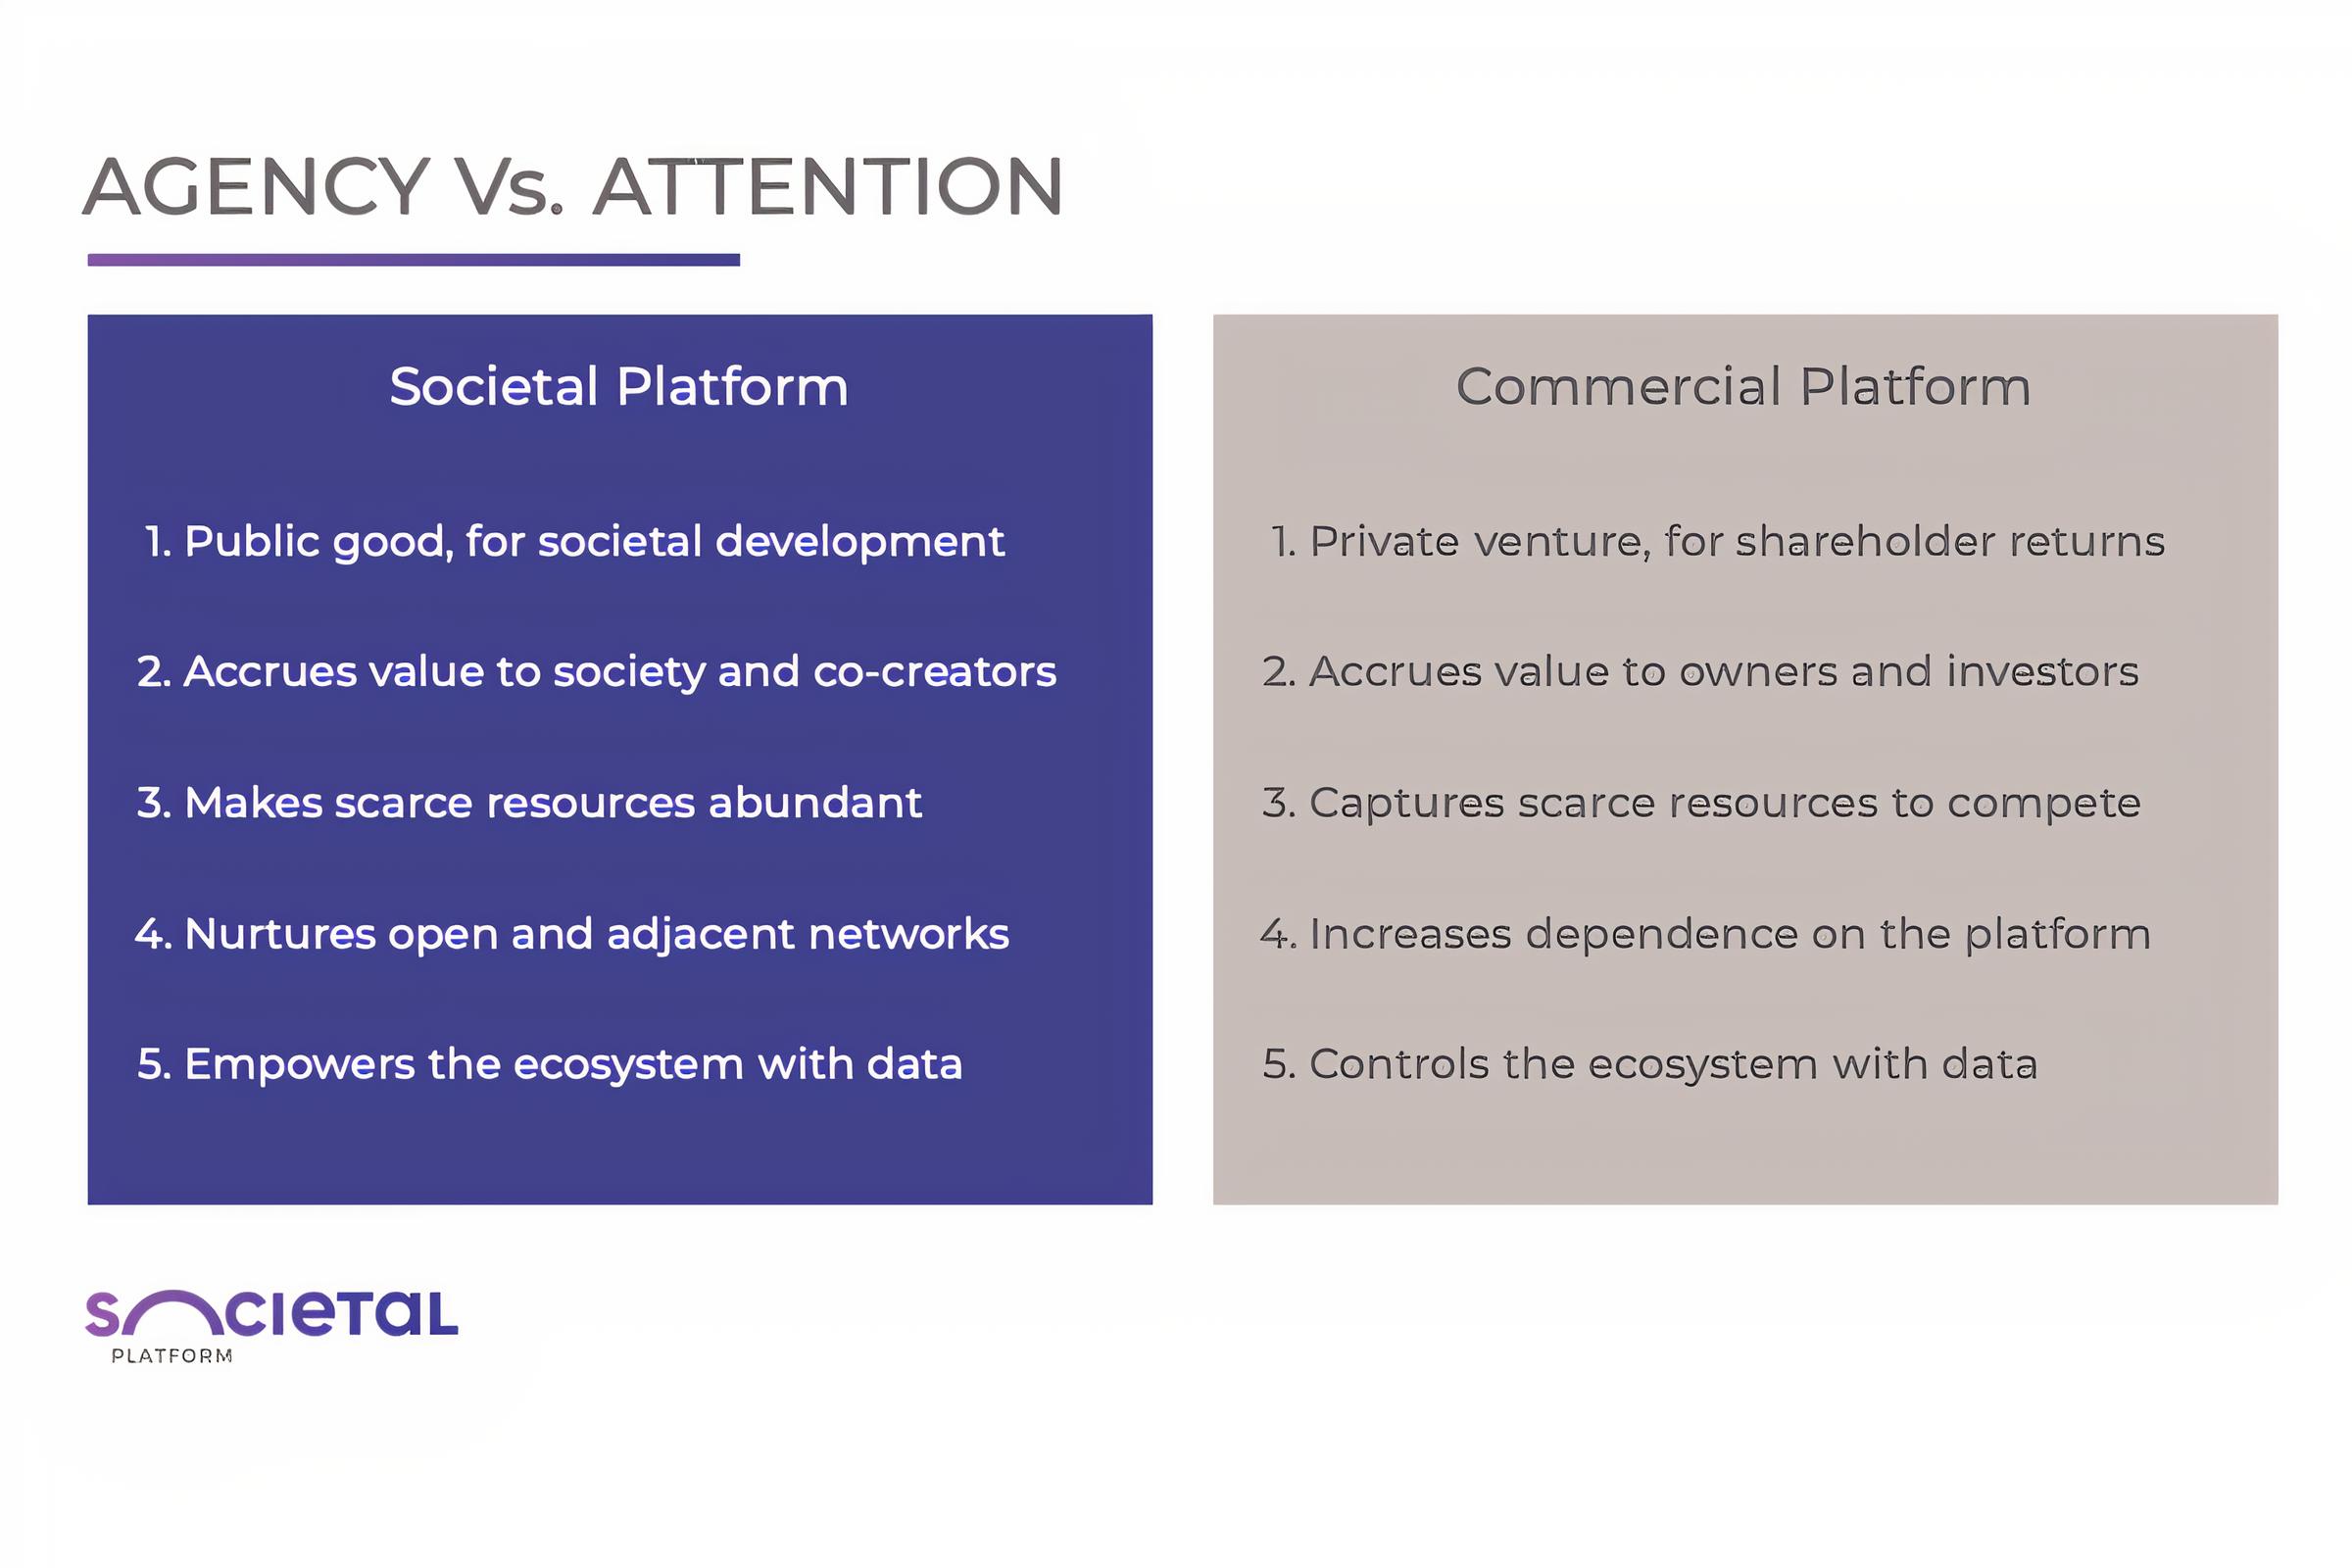 Societal Platform vs. Commercial Platform